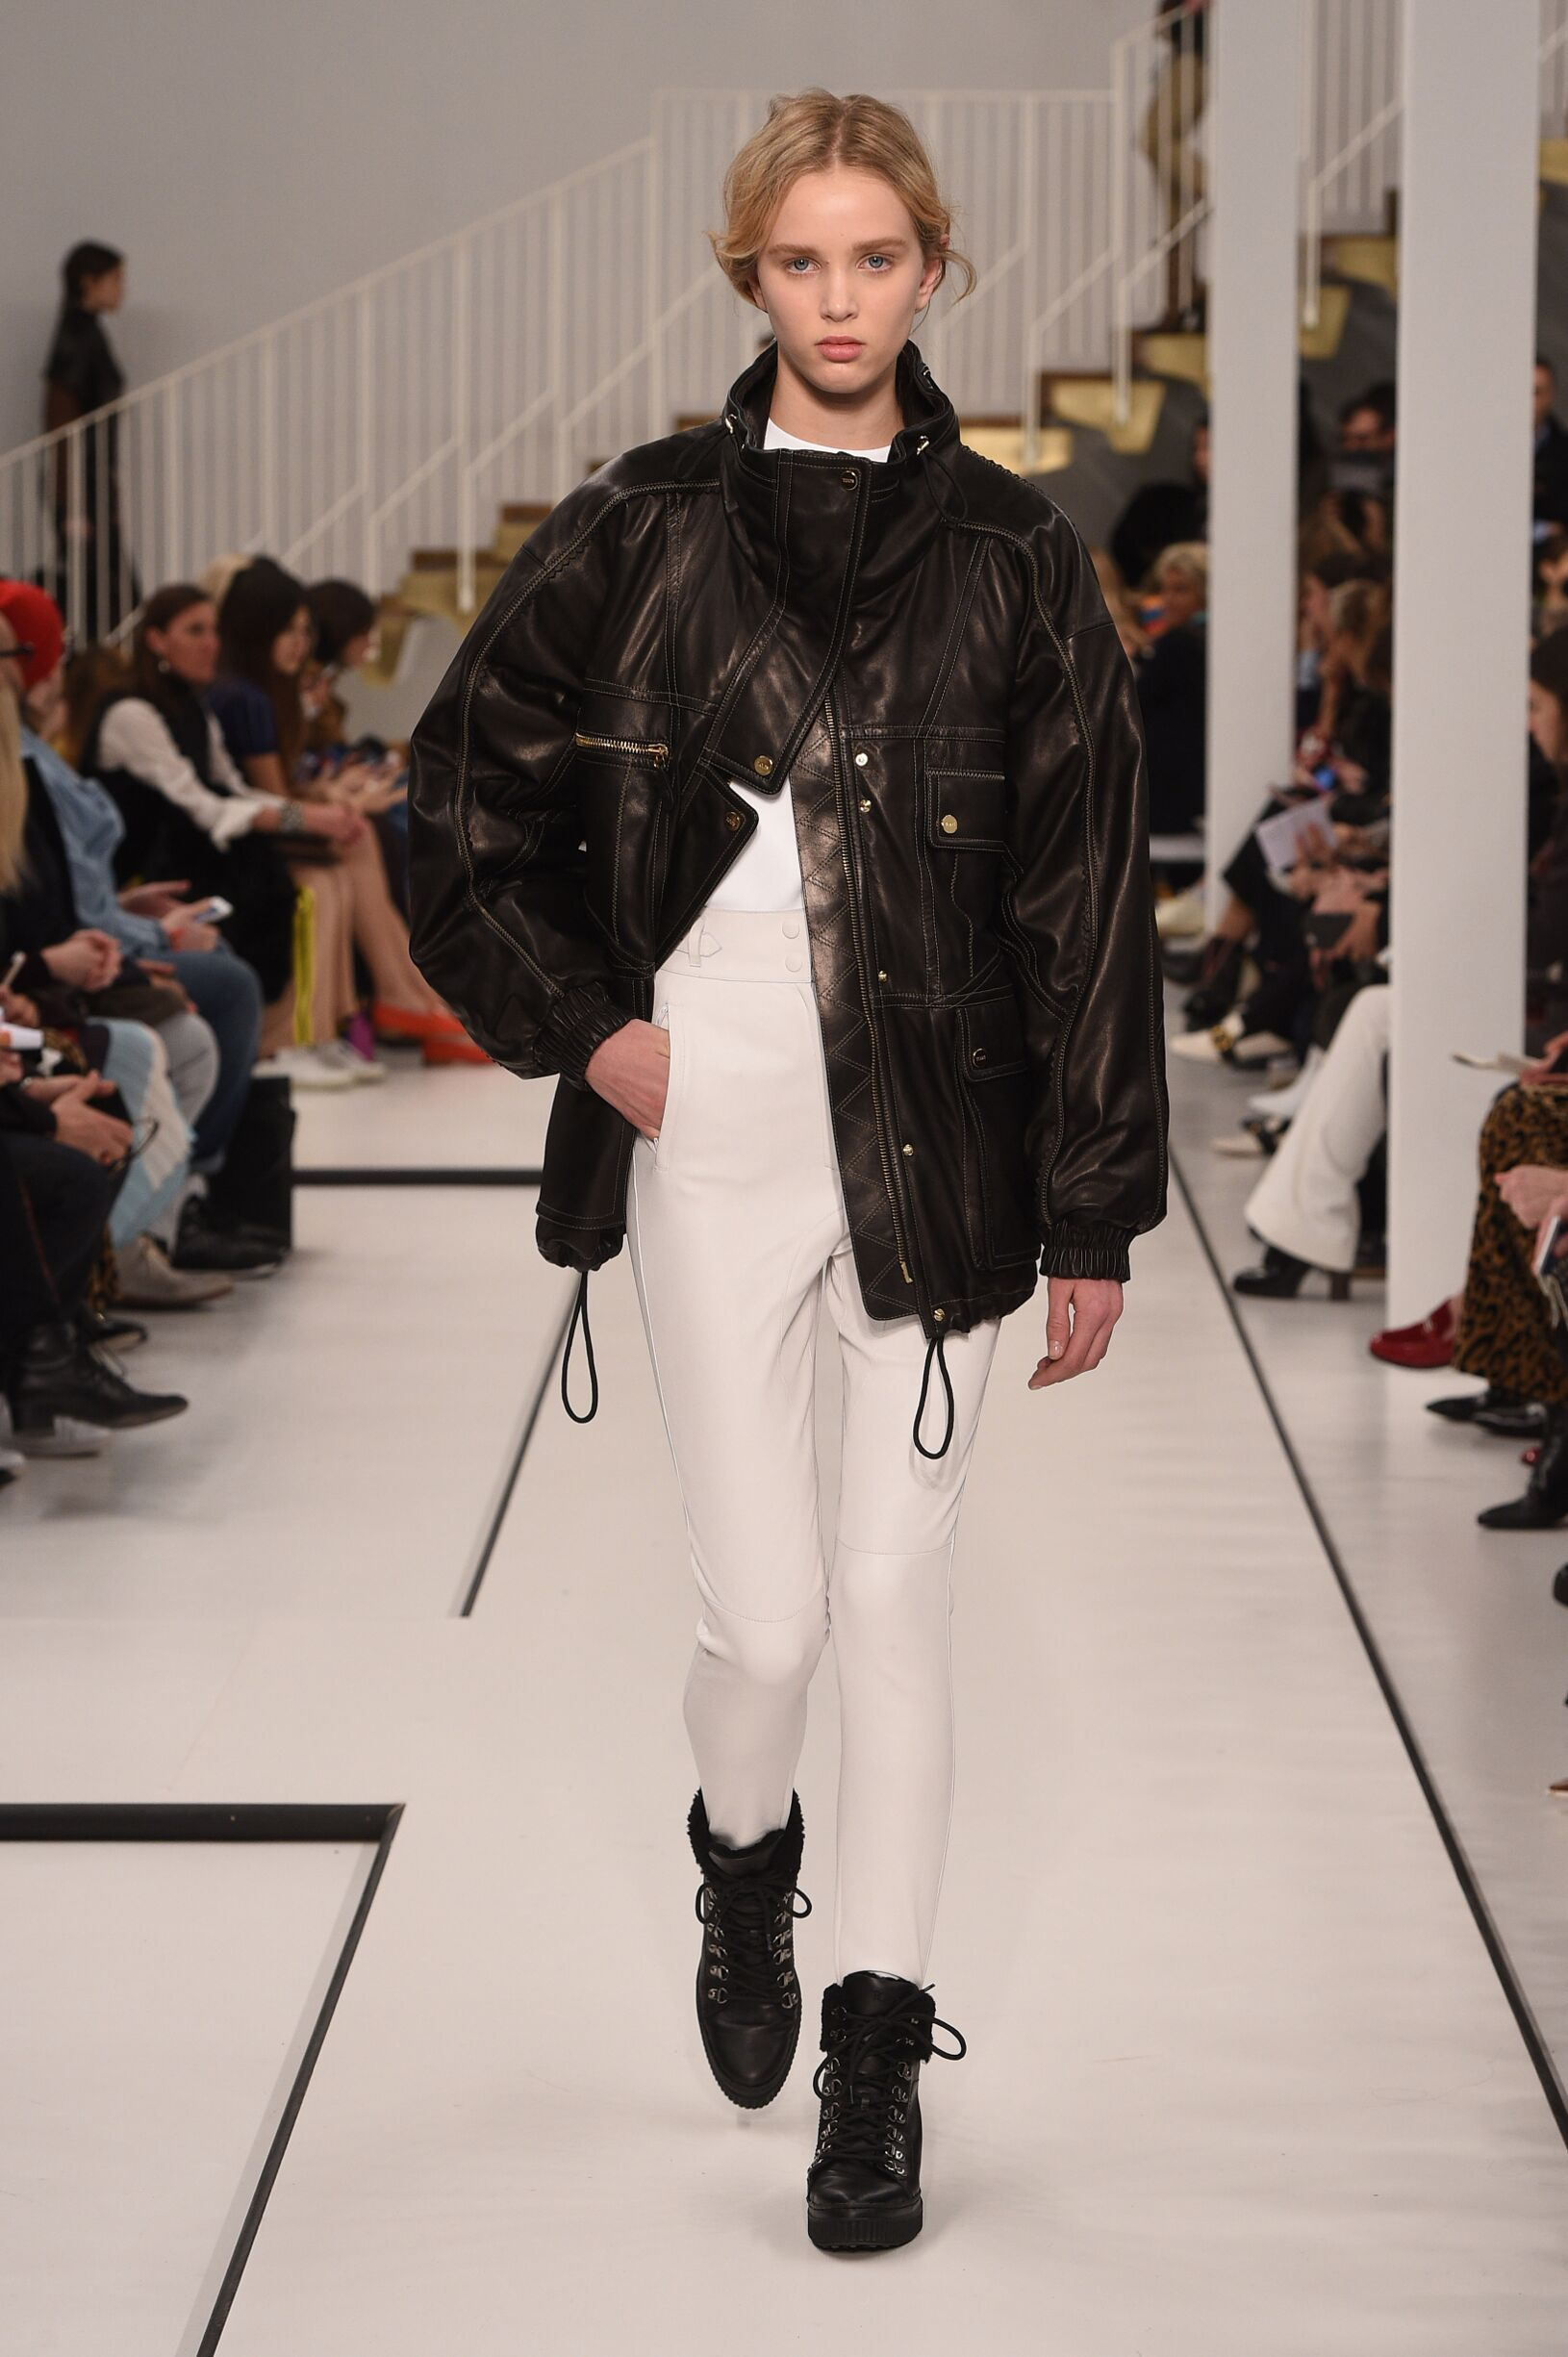 Fashion Woman Model Tod's Catwalk